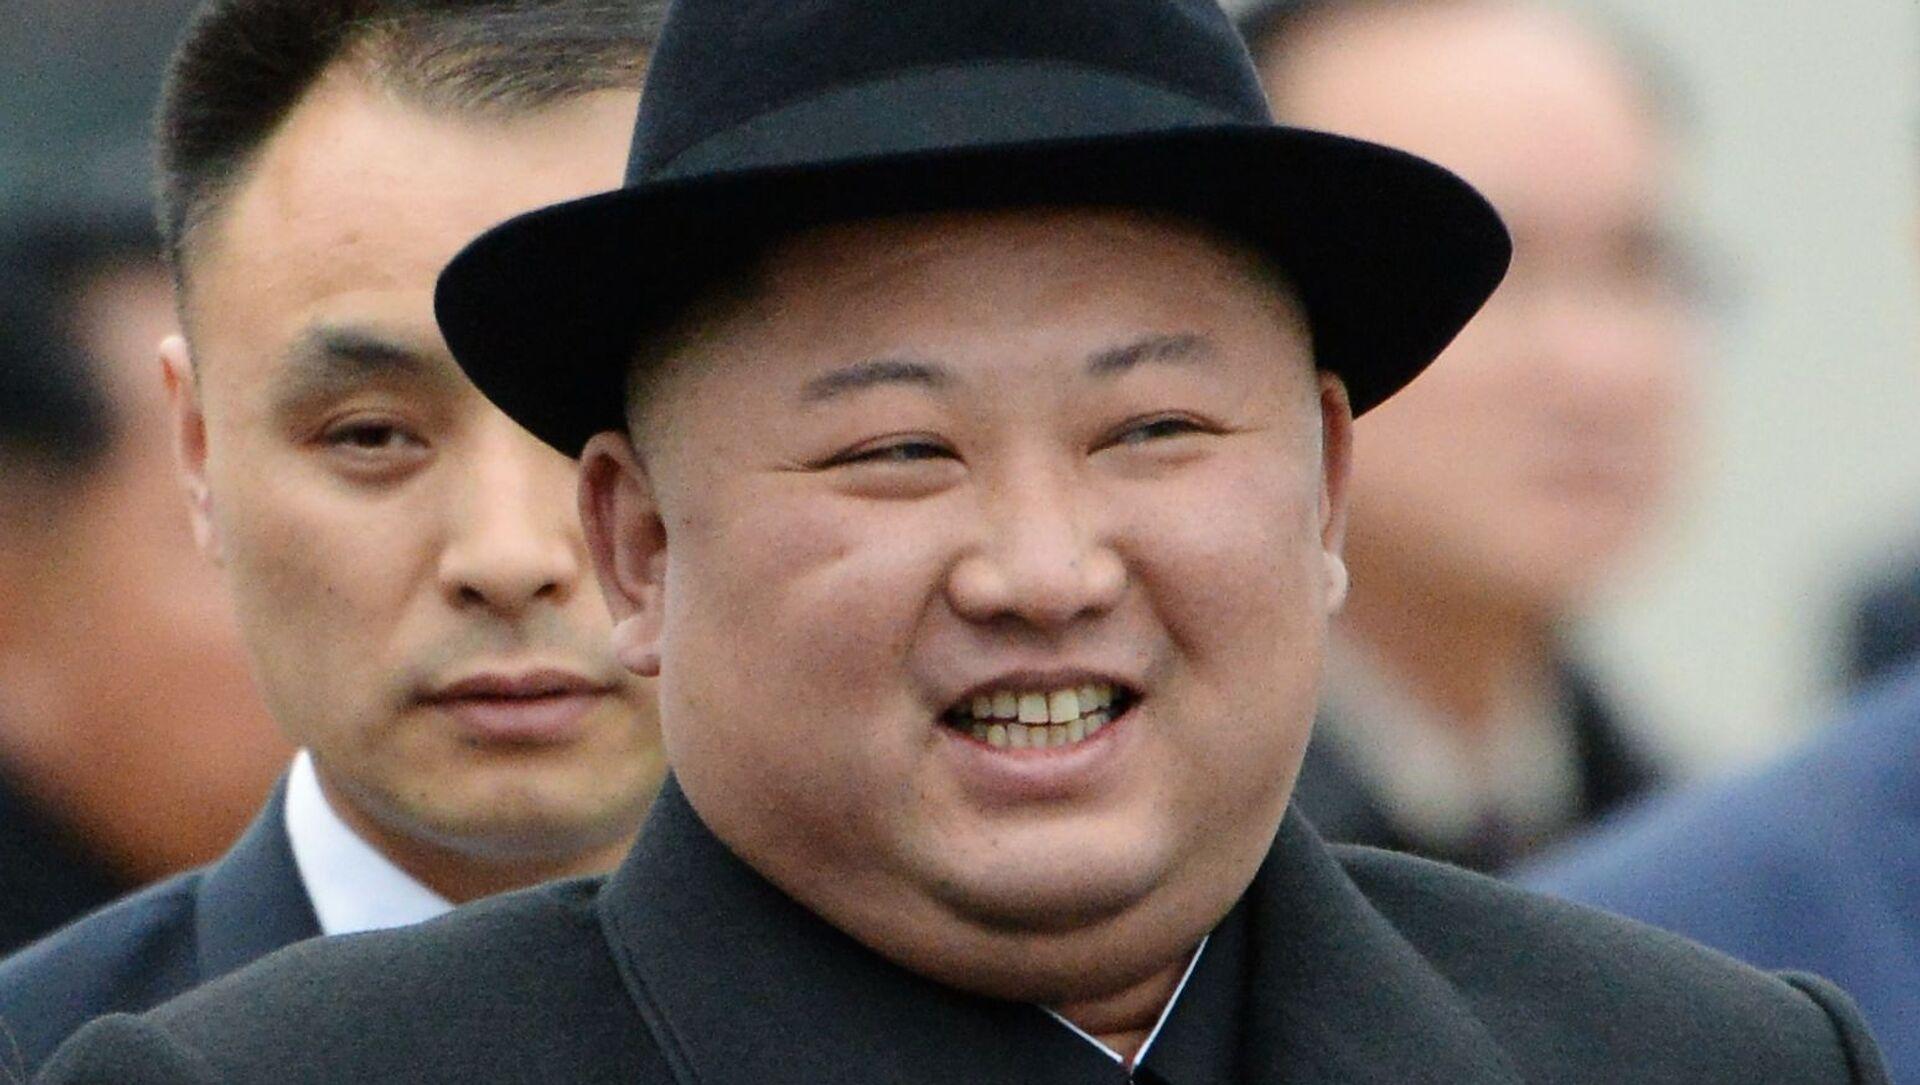 Kim Jong-un è arrivato a Vladivostok - Sputnik Italia, 1920, 25.02.2021